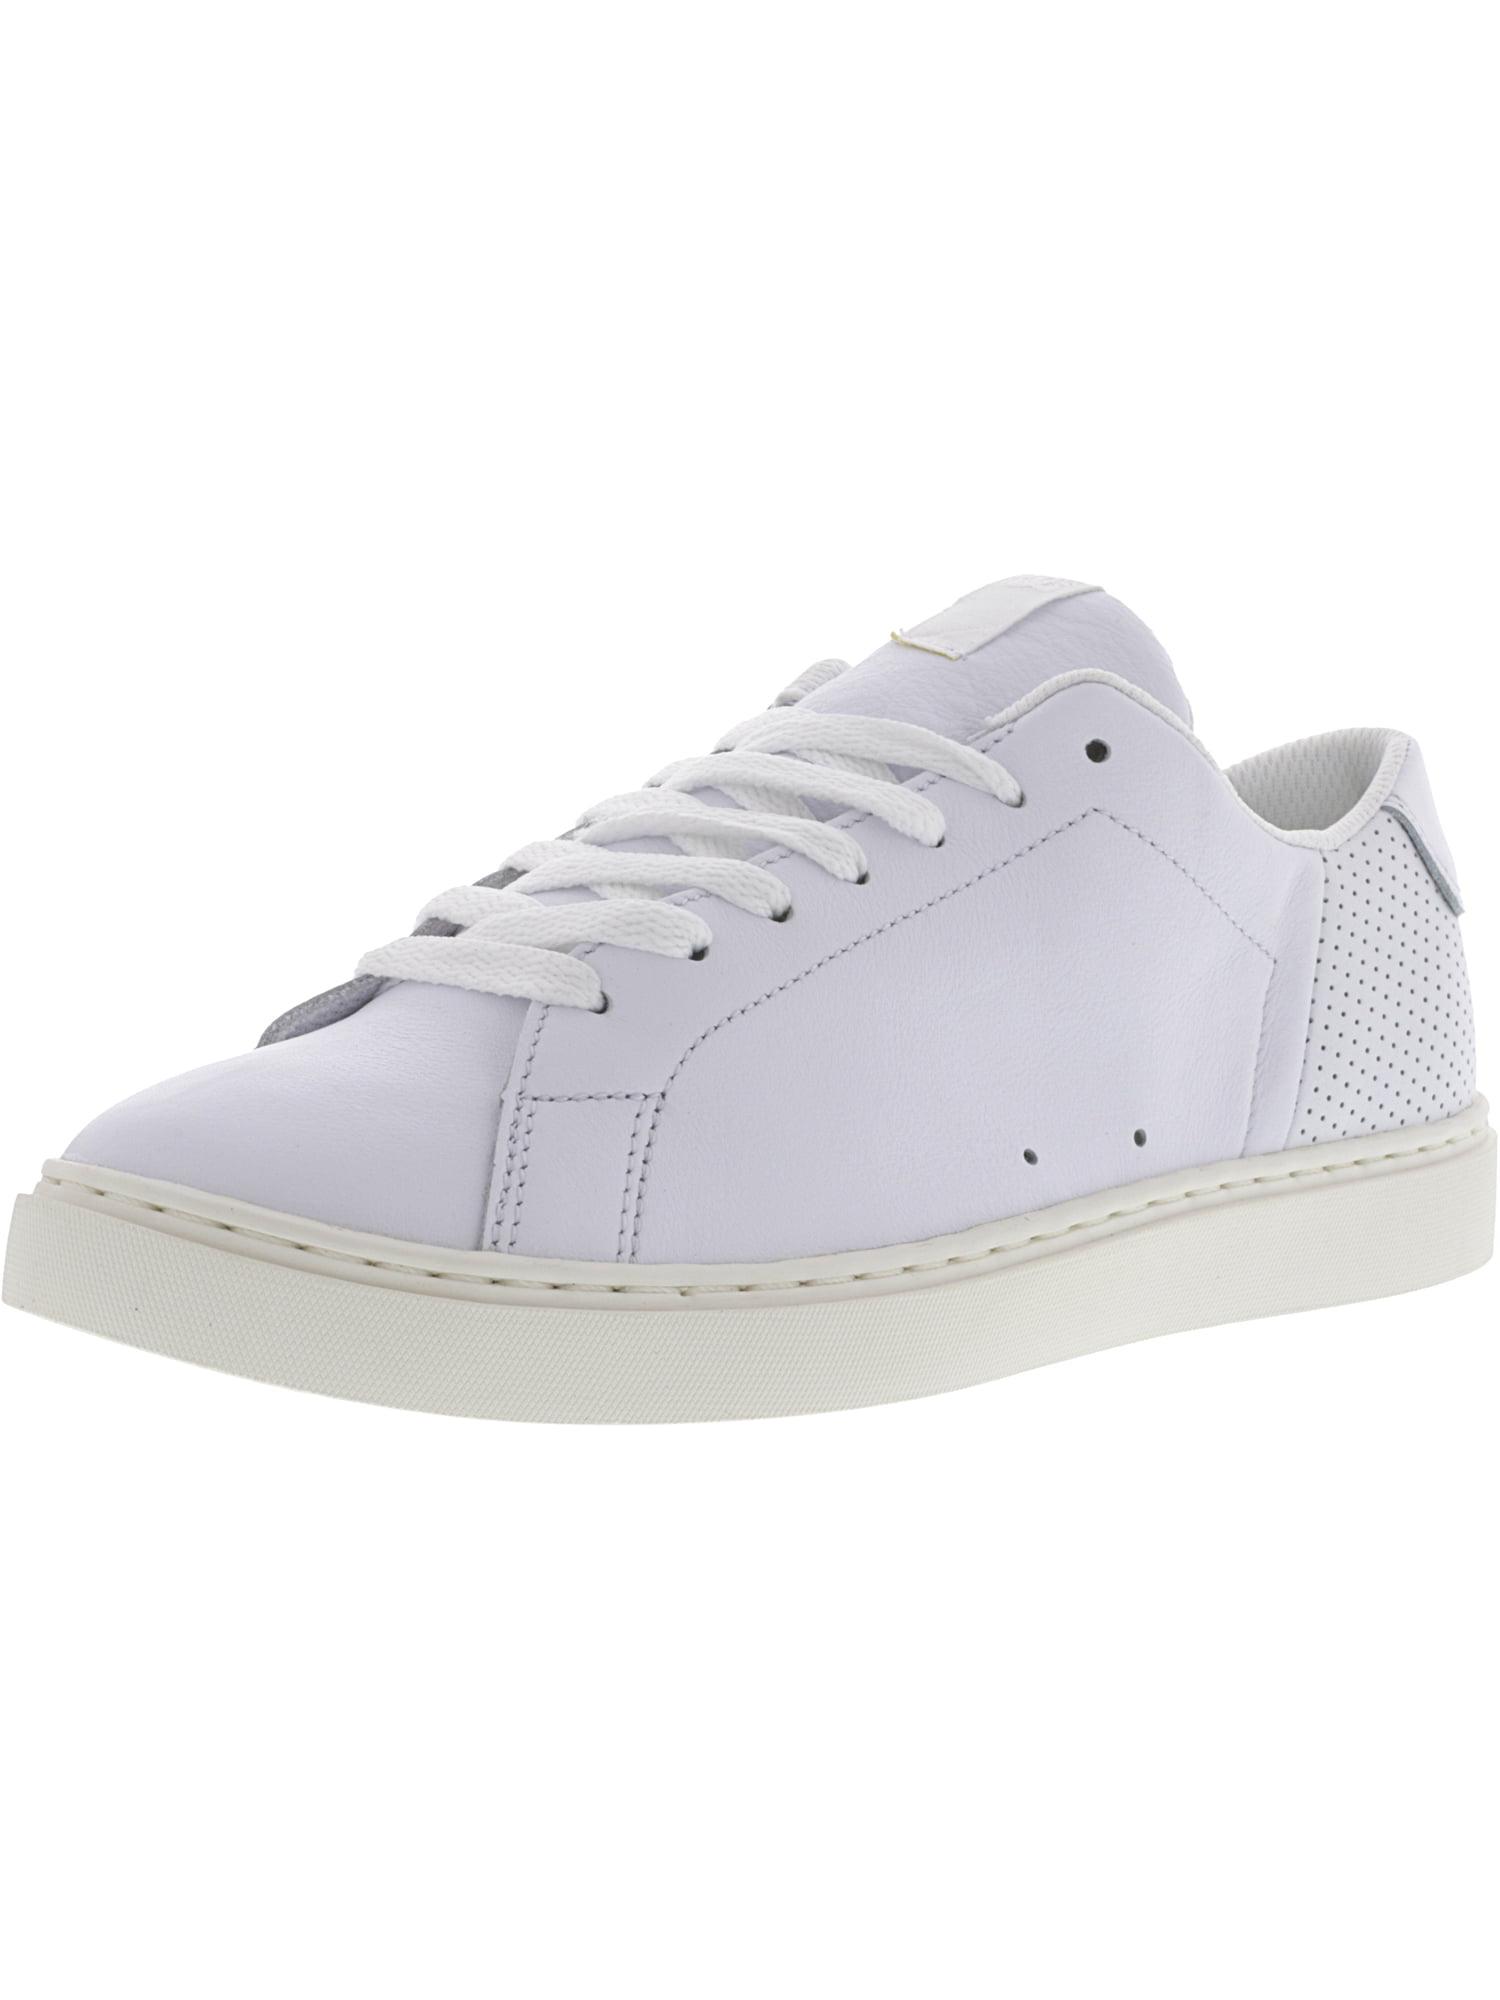 Dc Men's Reprieve Se White / Ankle-High Leather Skateboarding Shoe - 7M